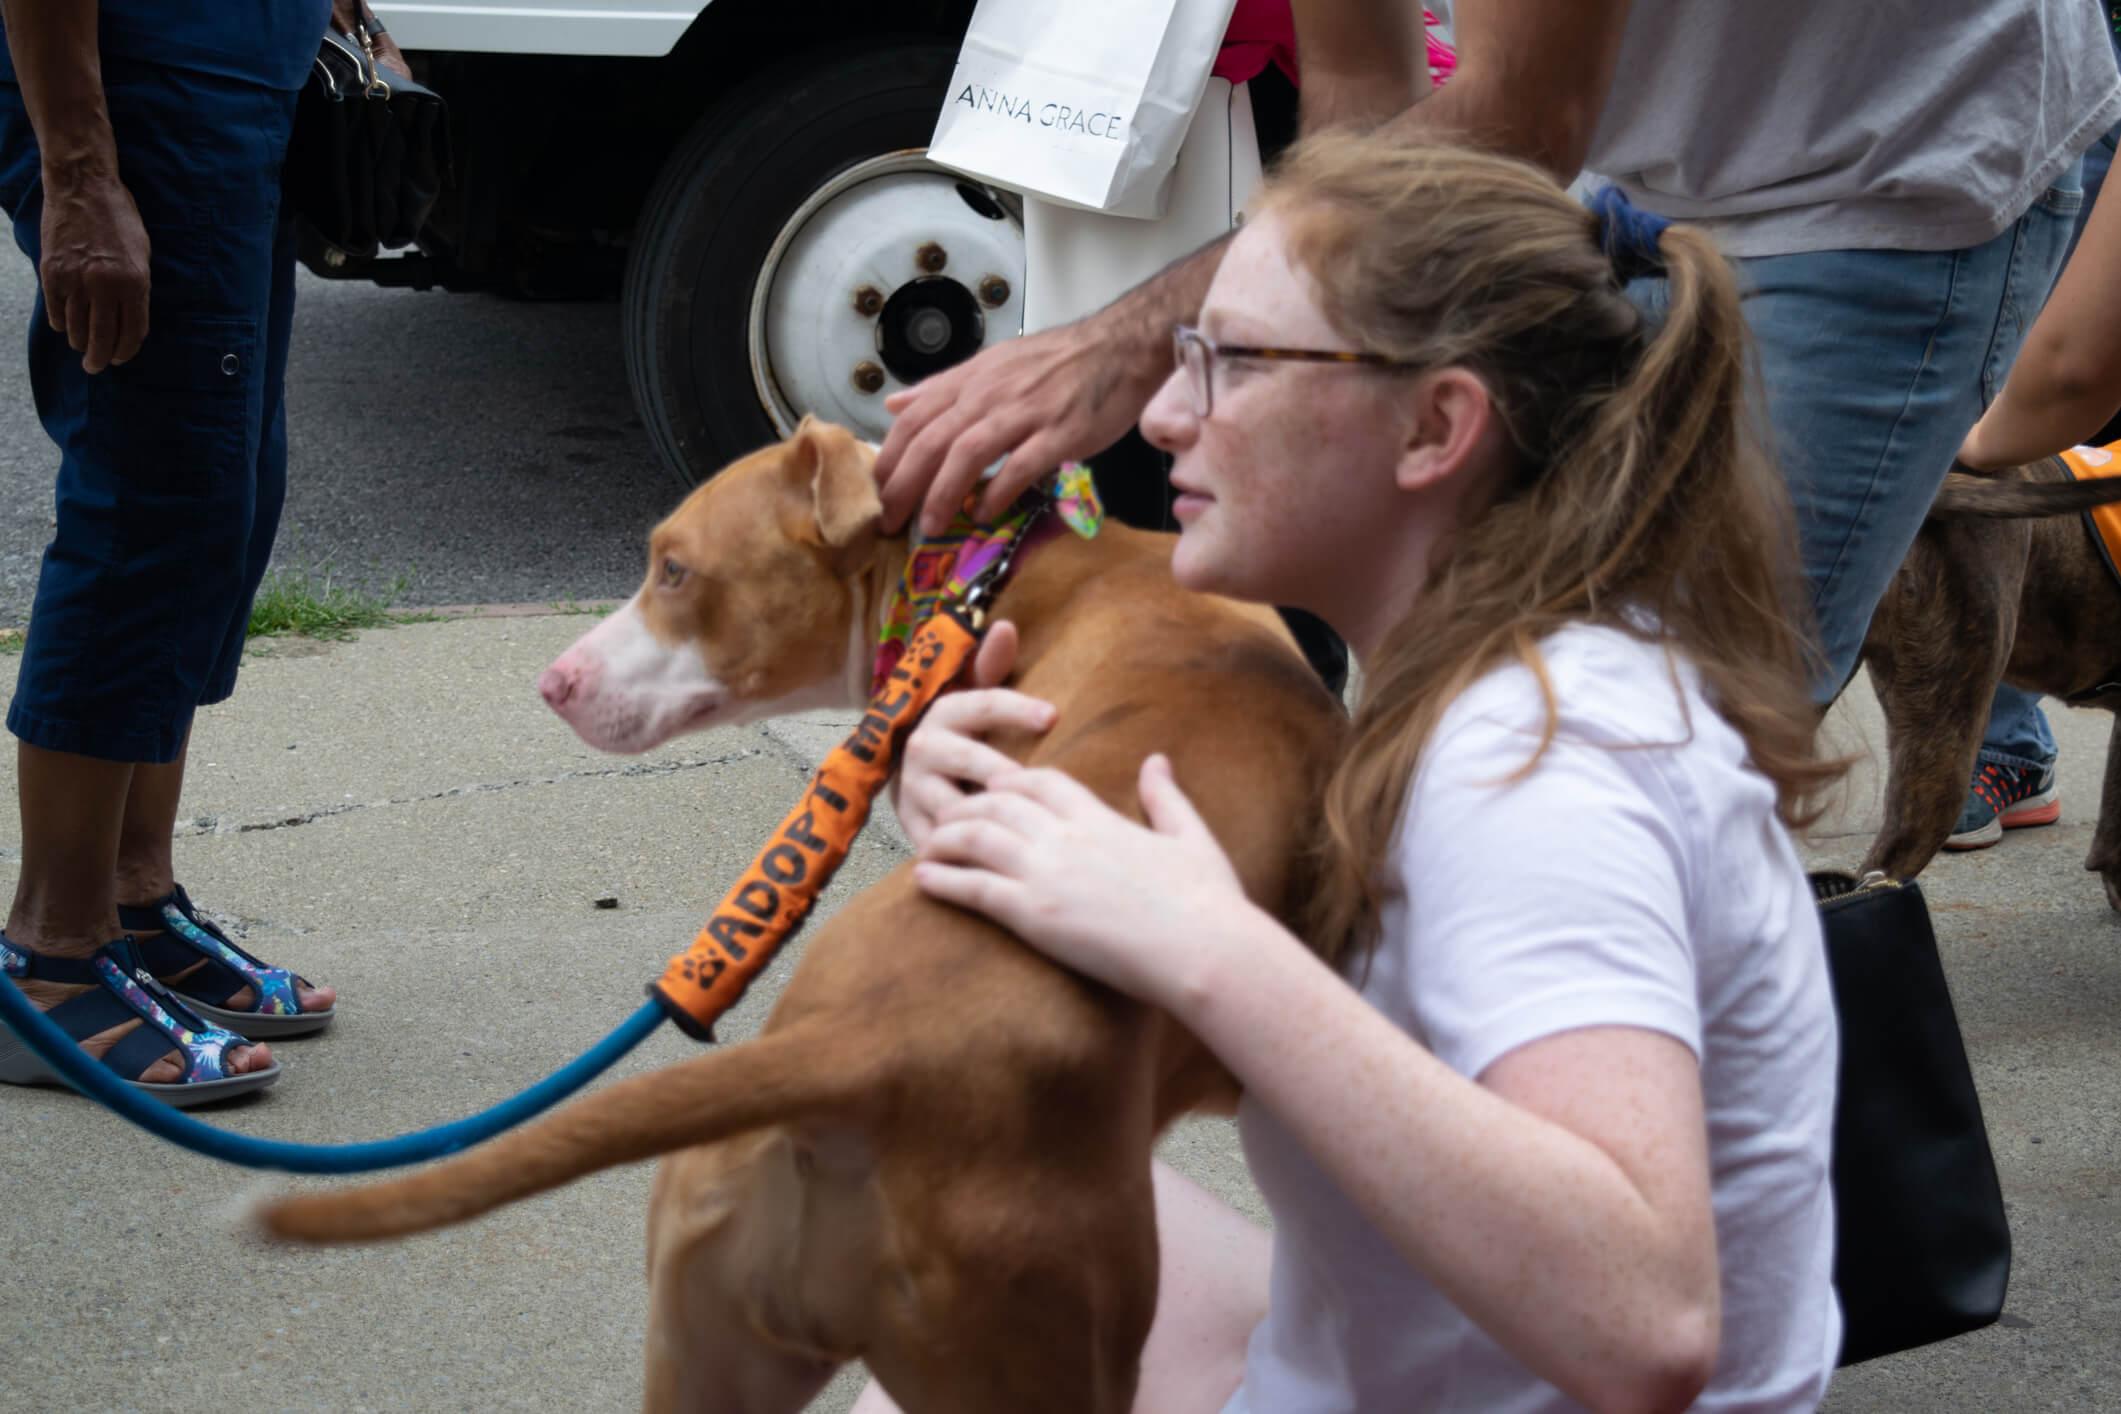 A woman hugs a shelter pet at an animal adoption event